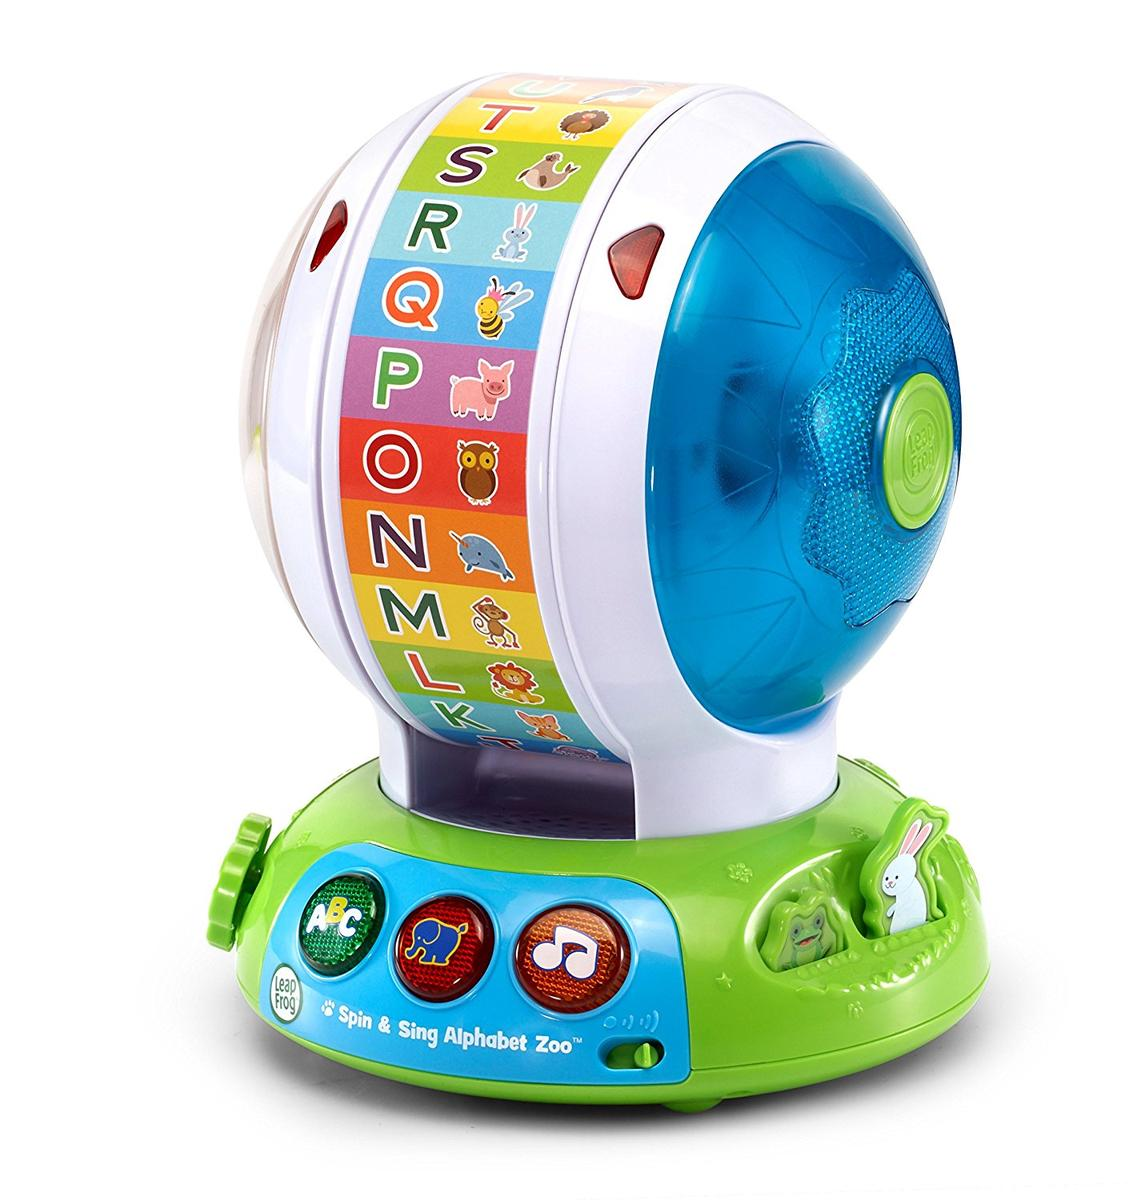 LeapFrog アルファベット 学習 知育玩具 おもちゃ おもちゃ アルファベット動物園 学習 海外 子供 幼児 知育玩具, クセグン:d882a6ec --- gallery-rugdoll.com